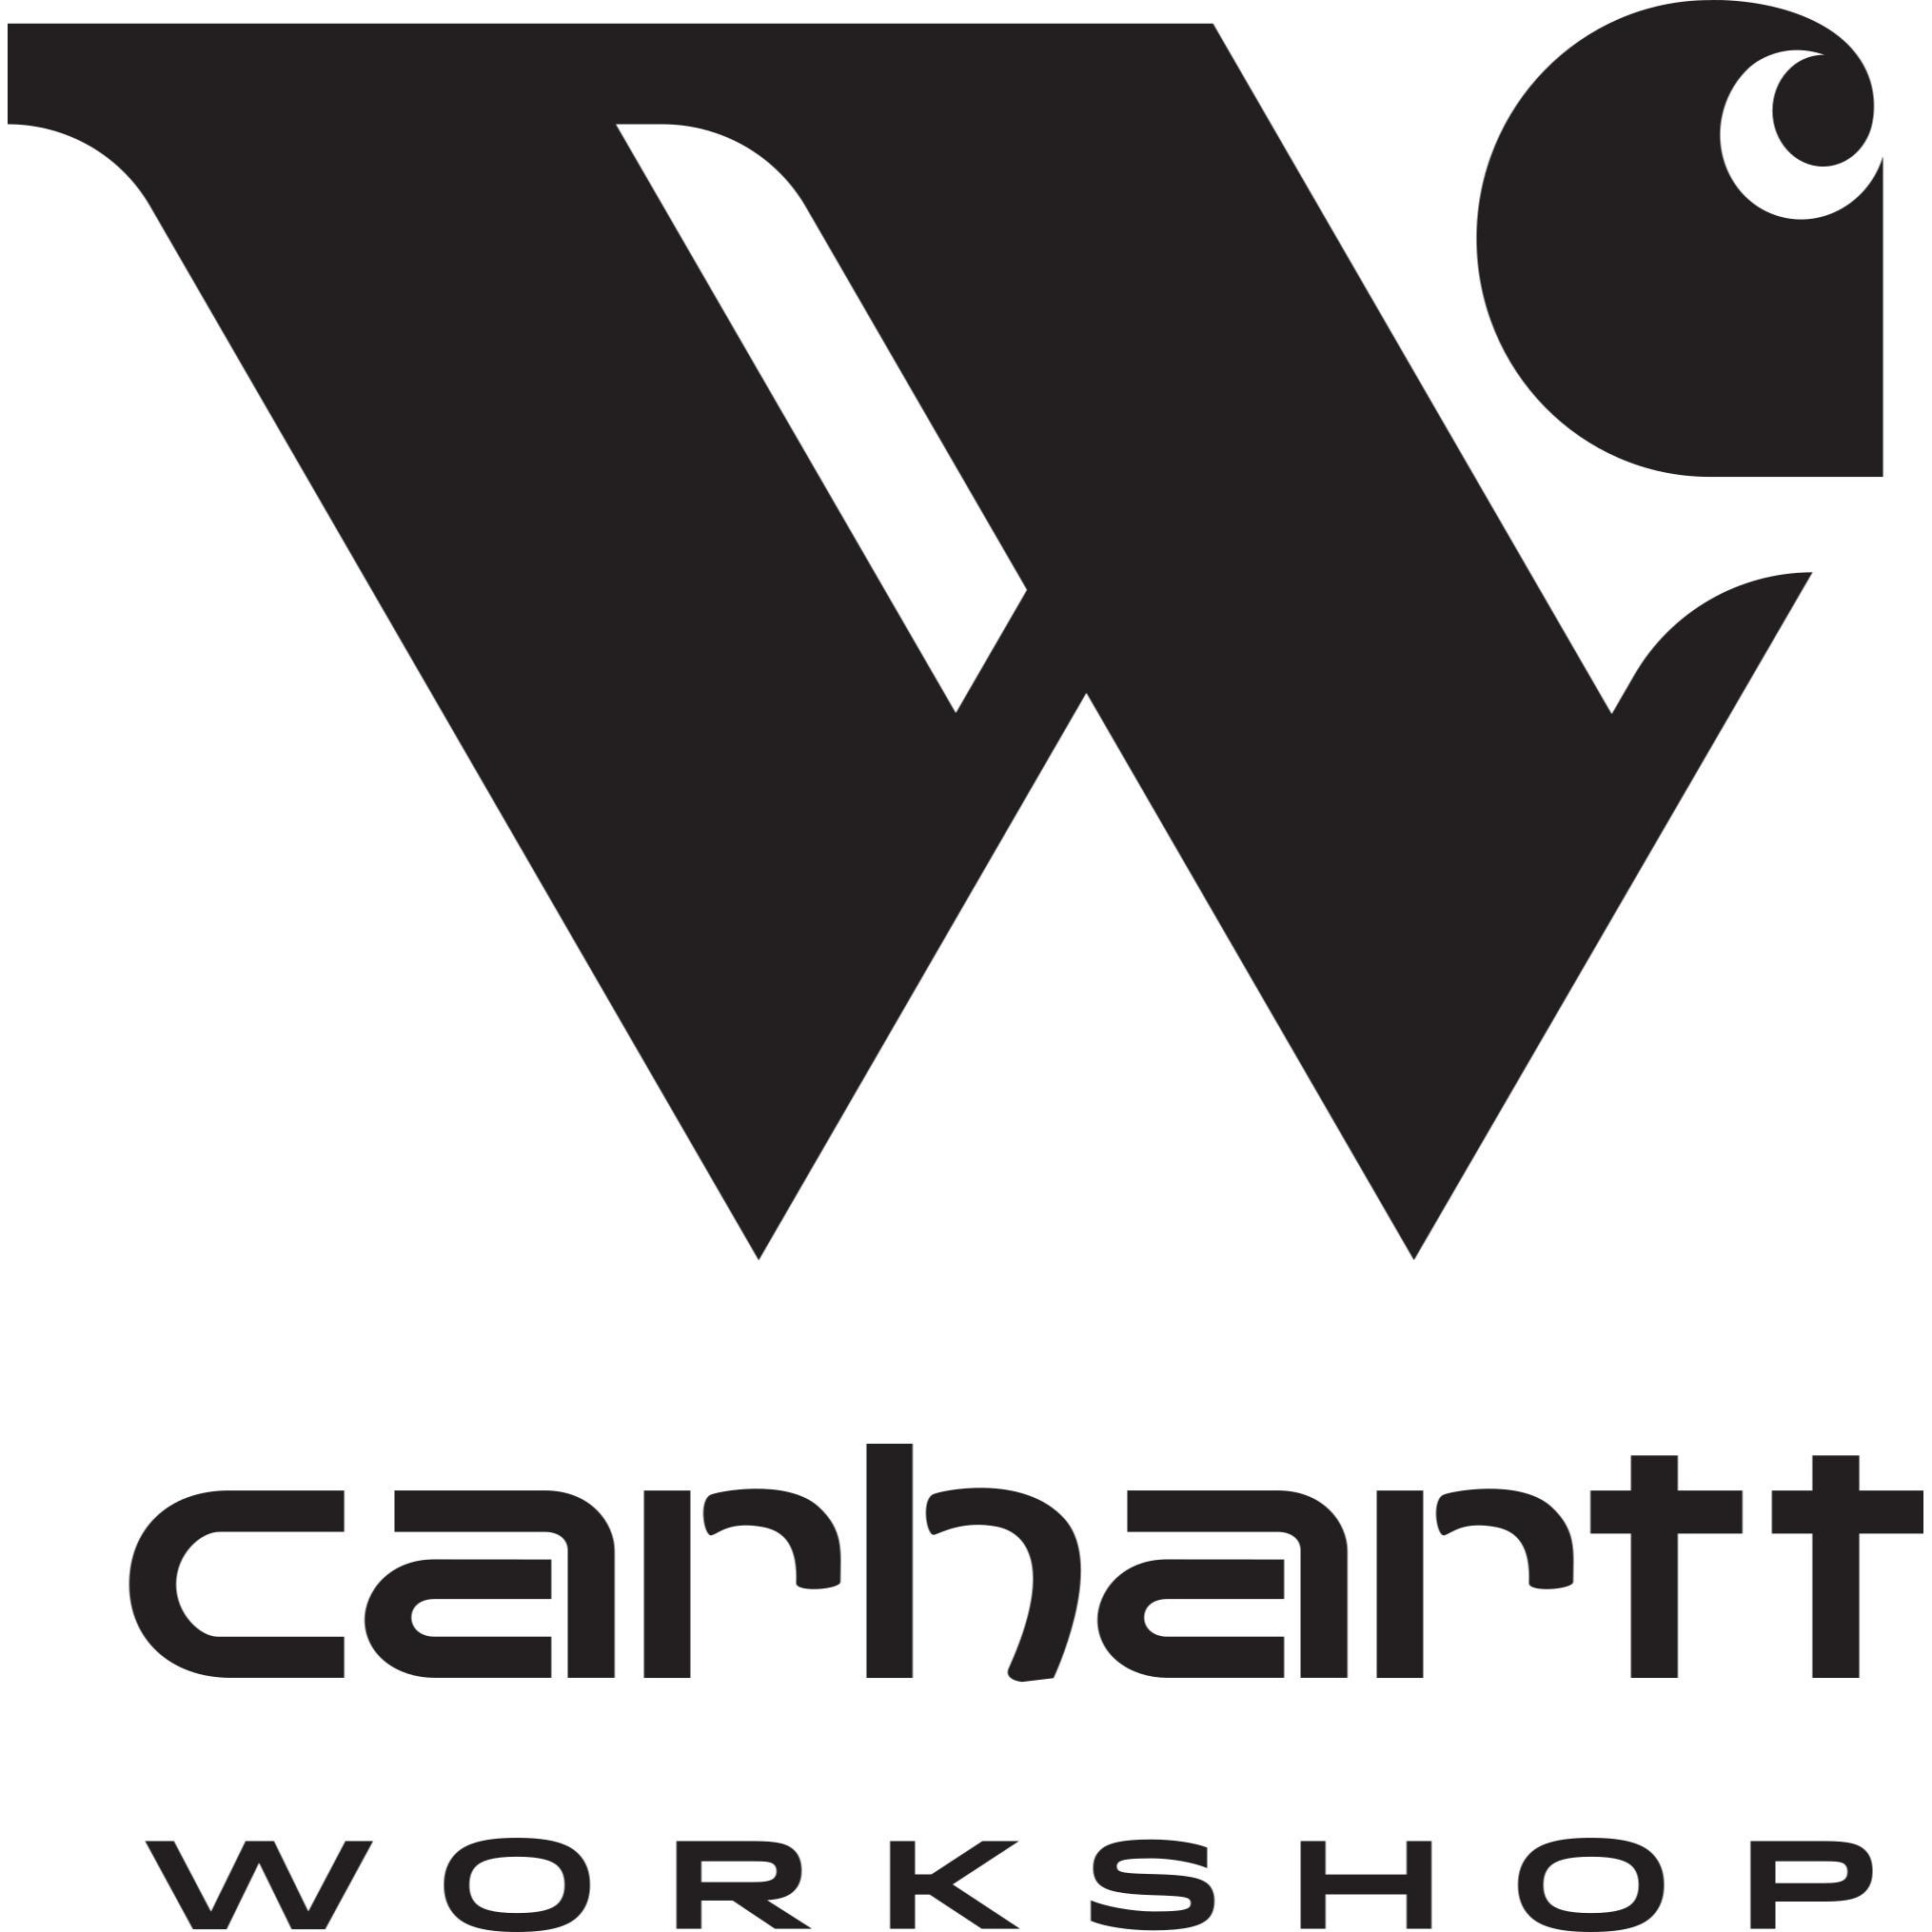 The Carhartt Workshop